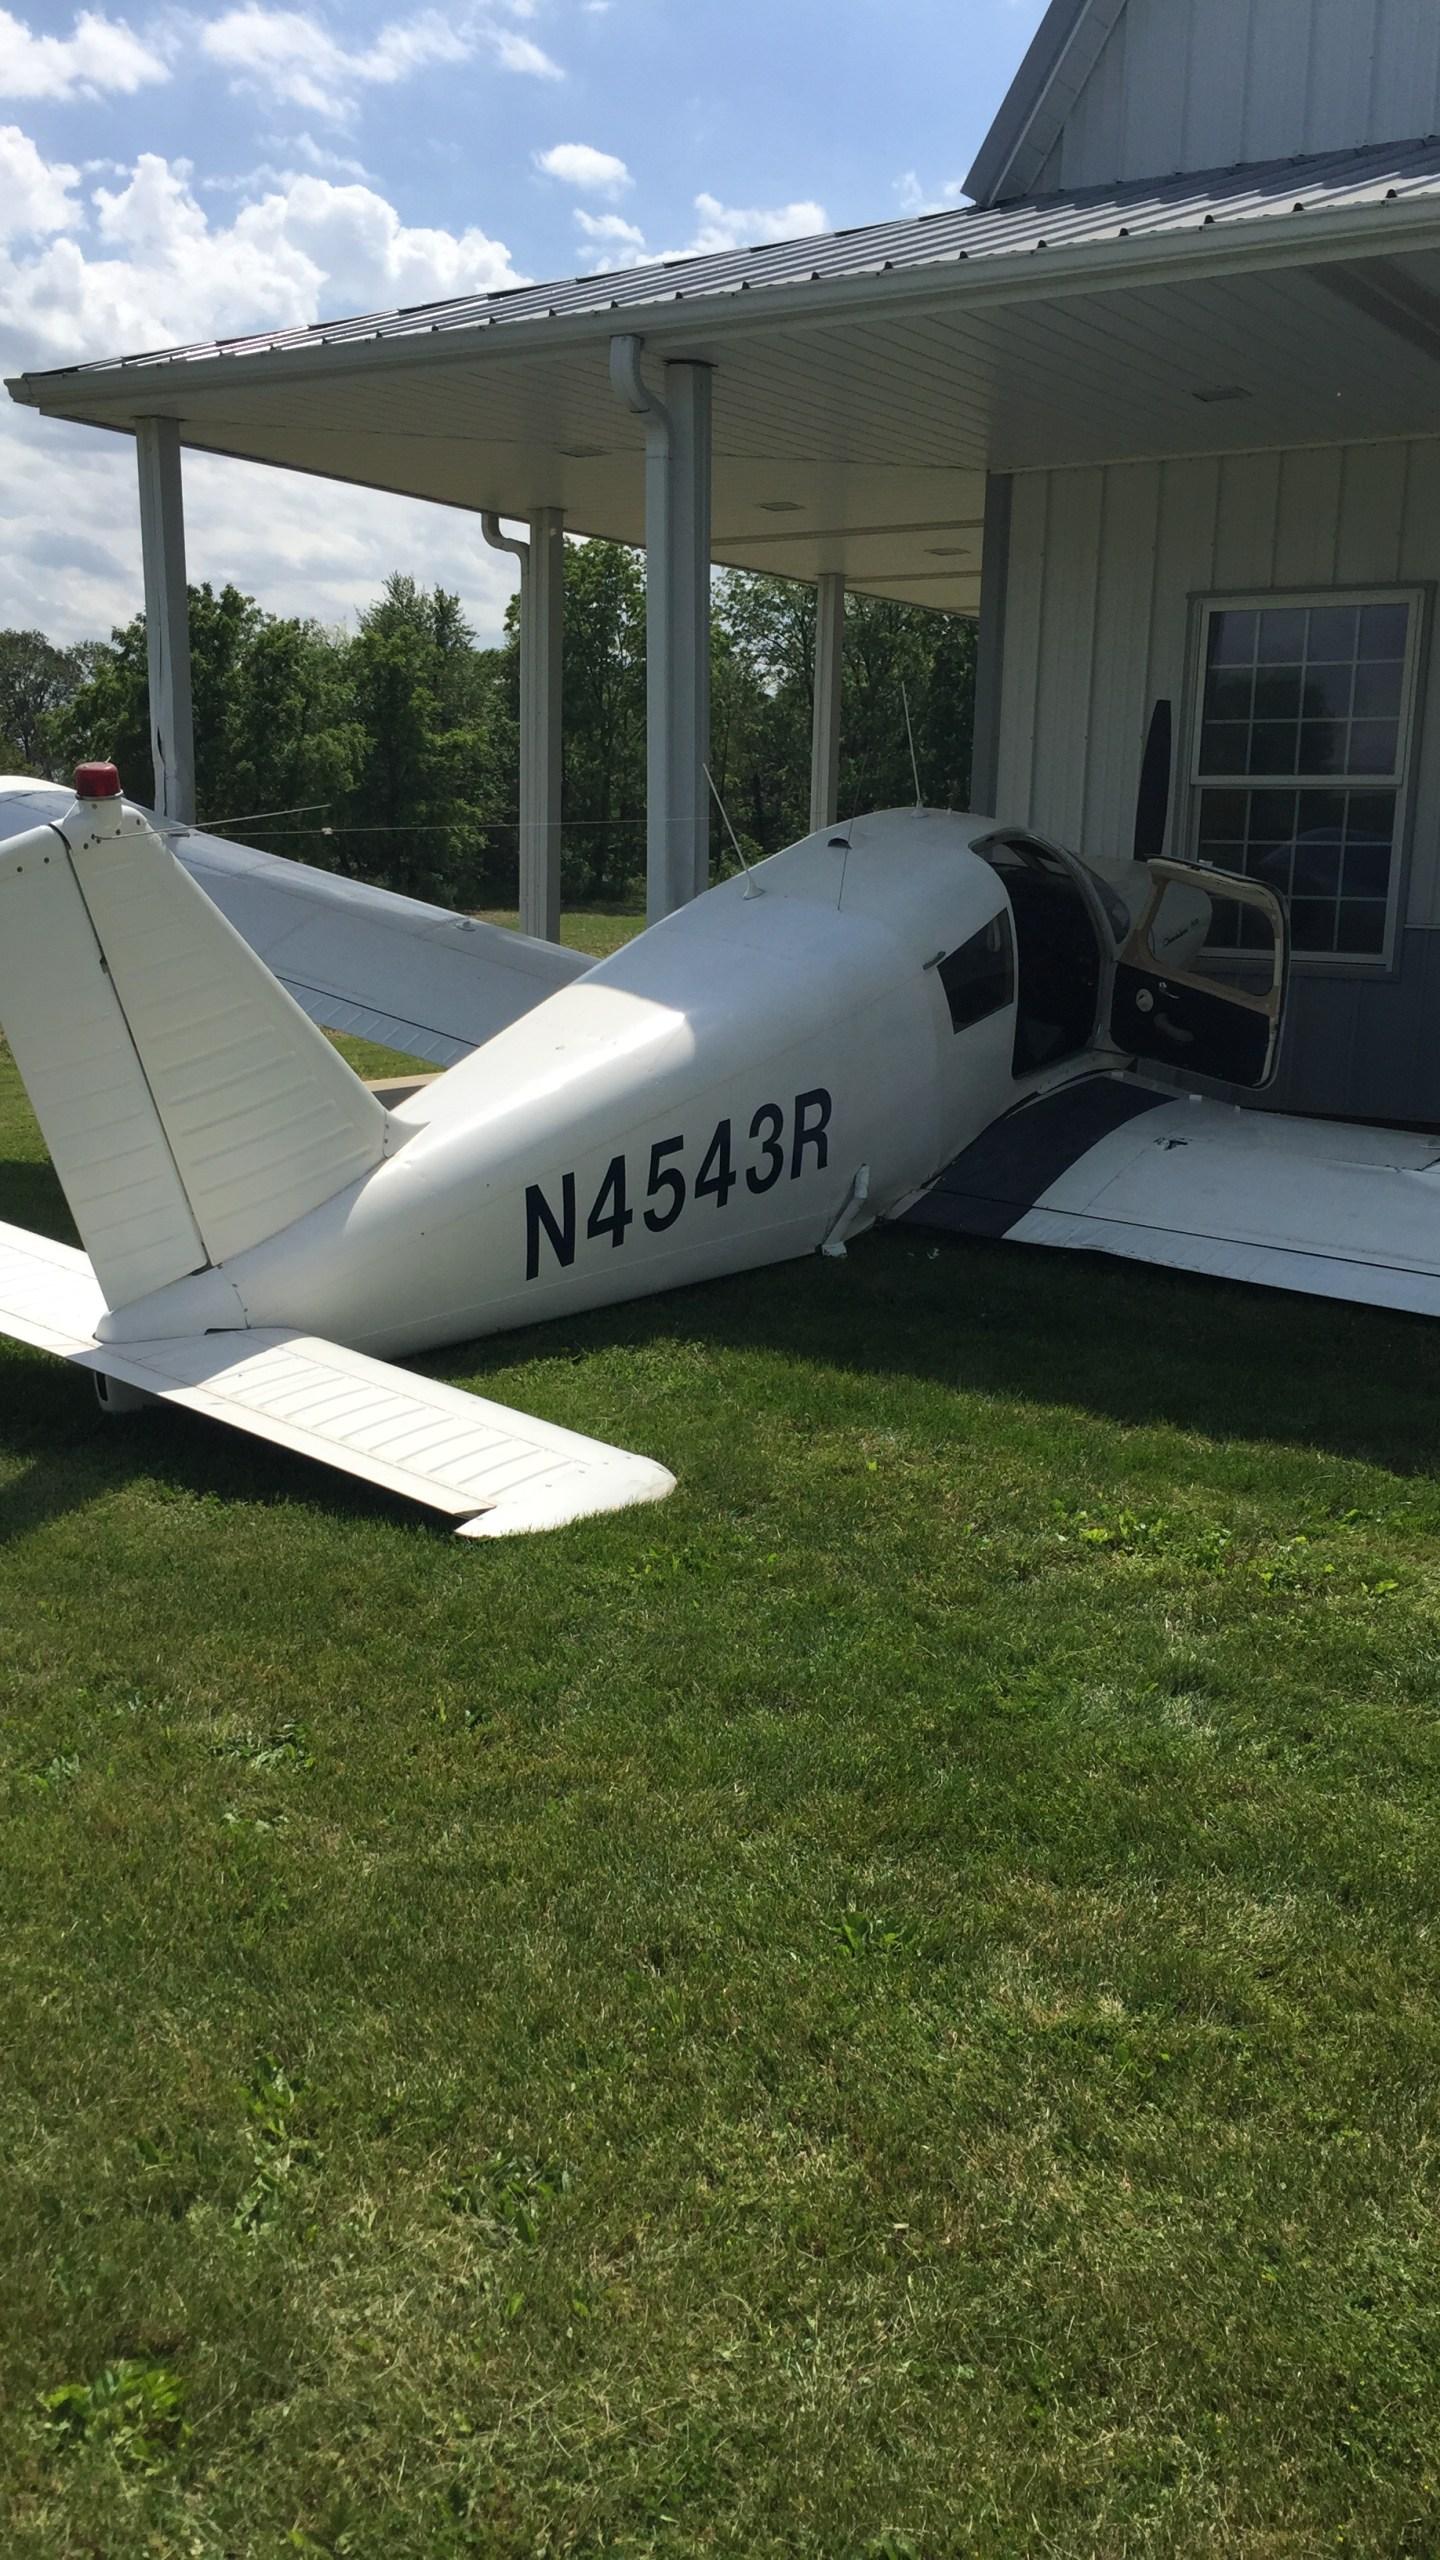 dekalb plane crash2_264231